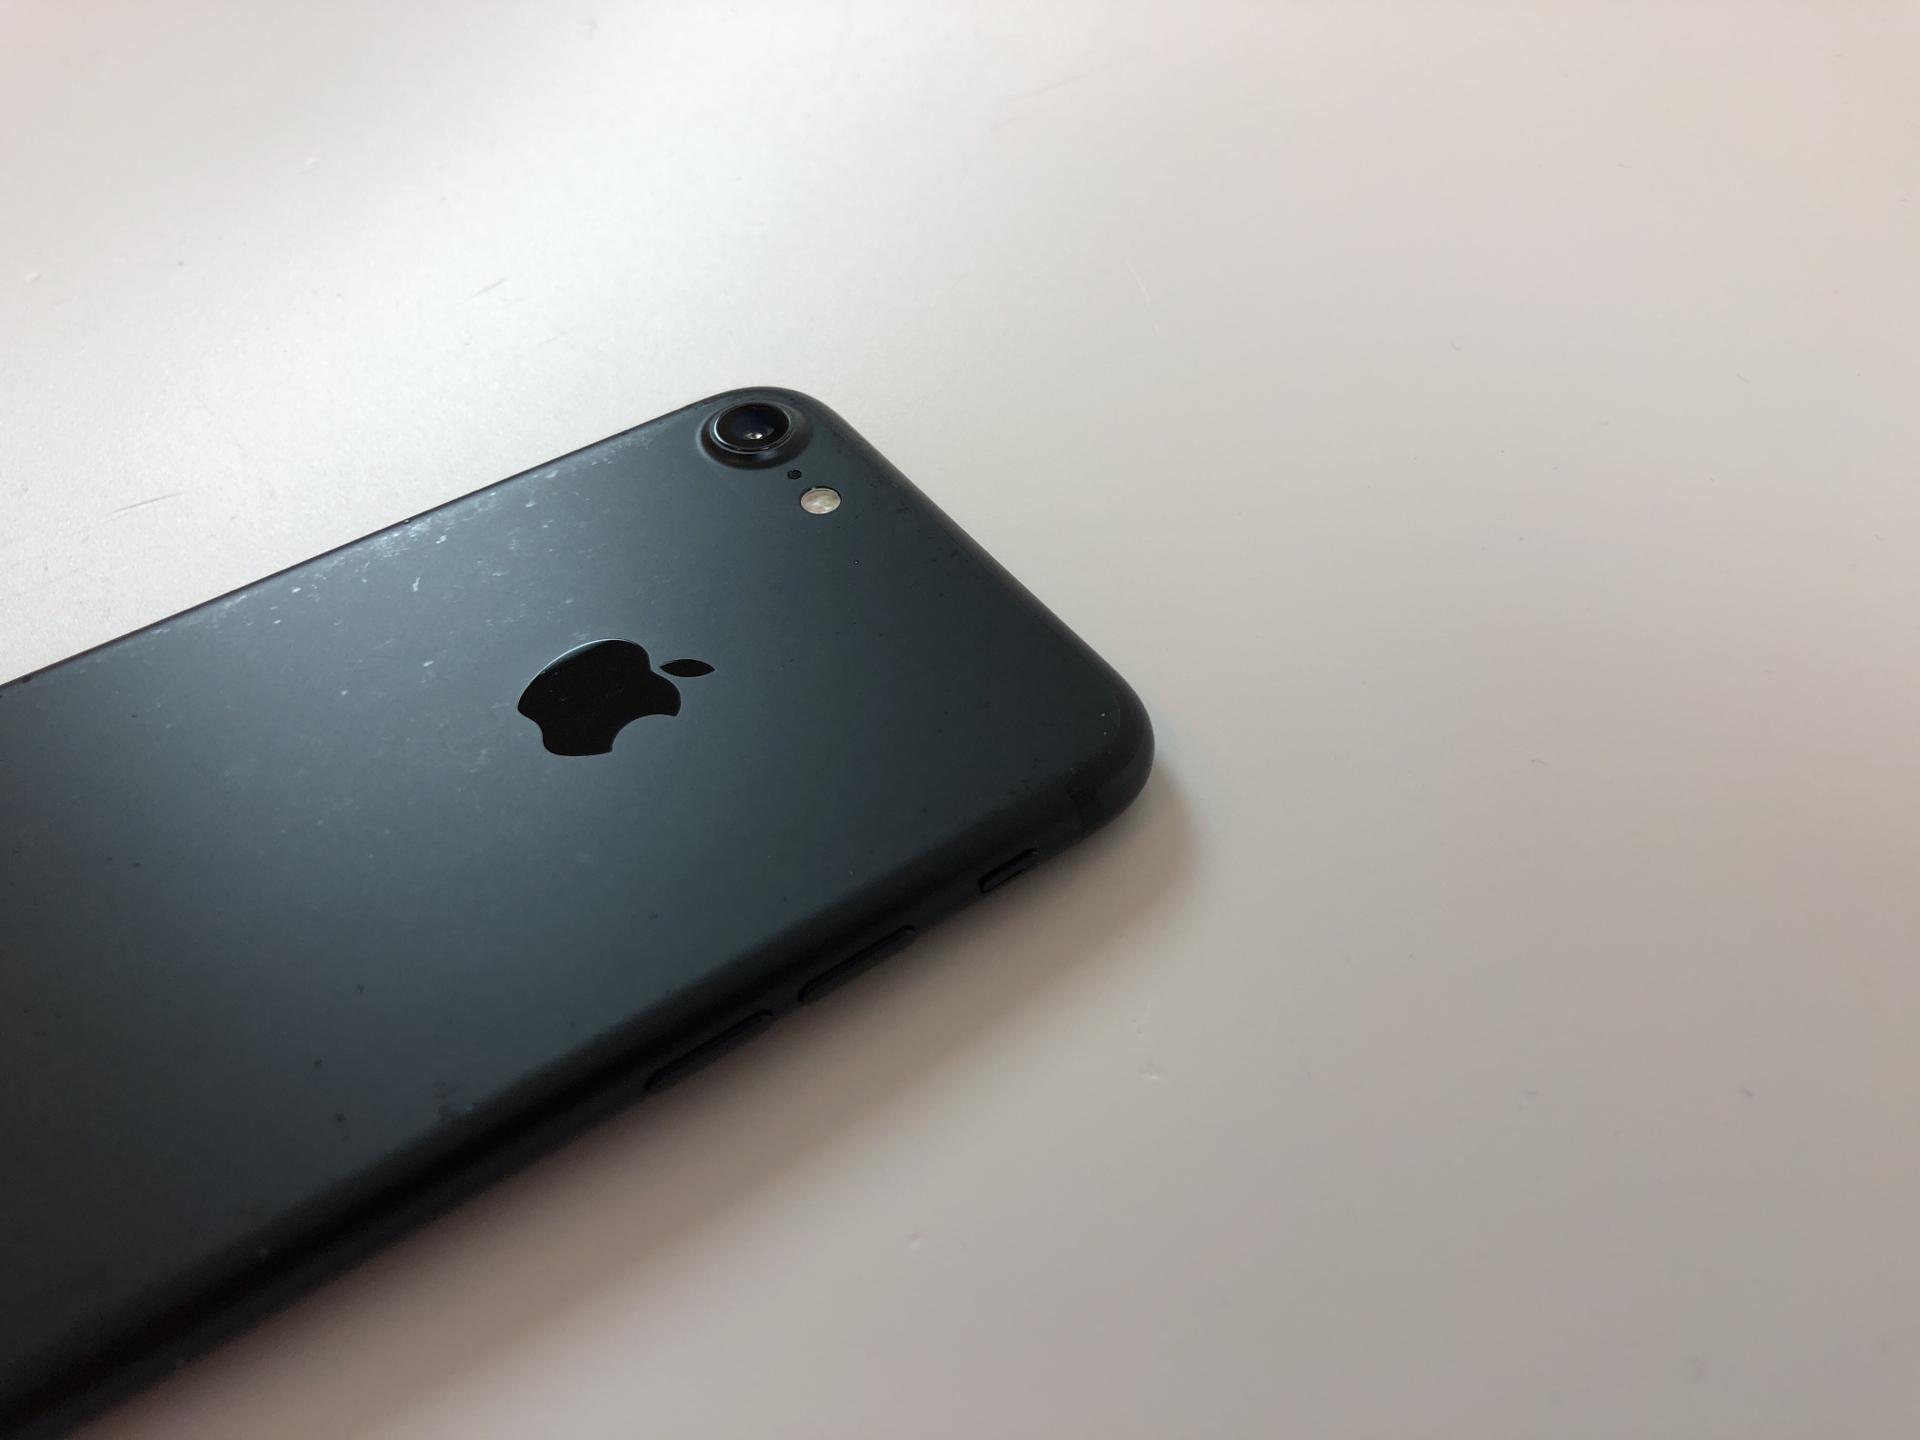 iPhone 7 128GB, 128GB, Black, bild 6